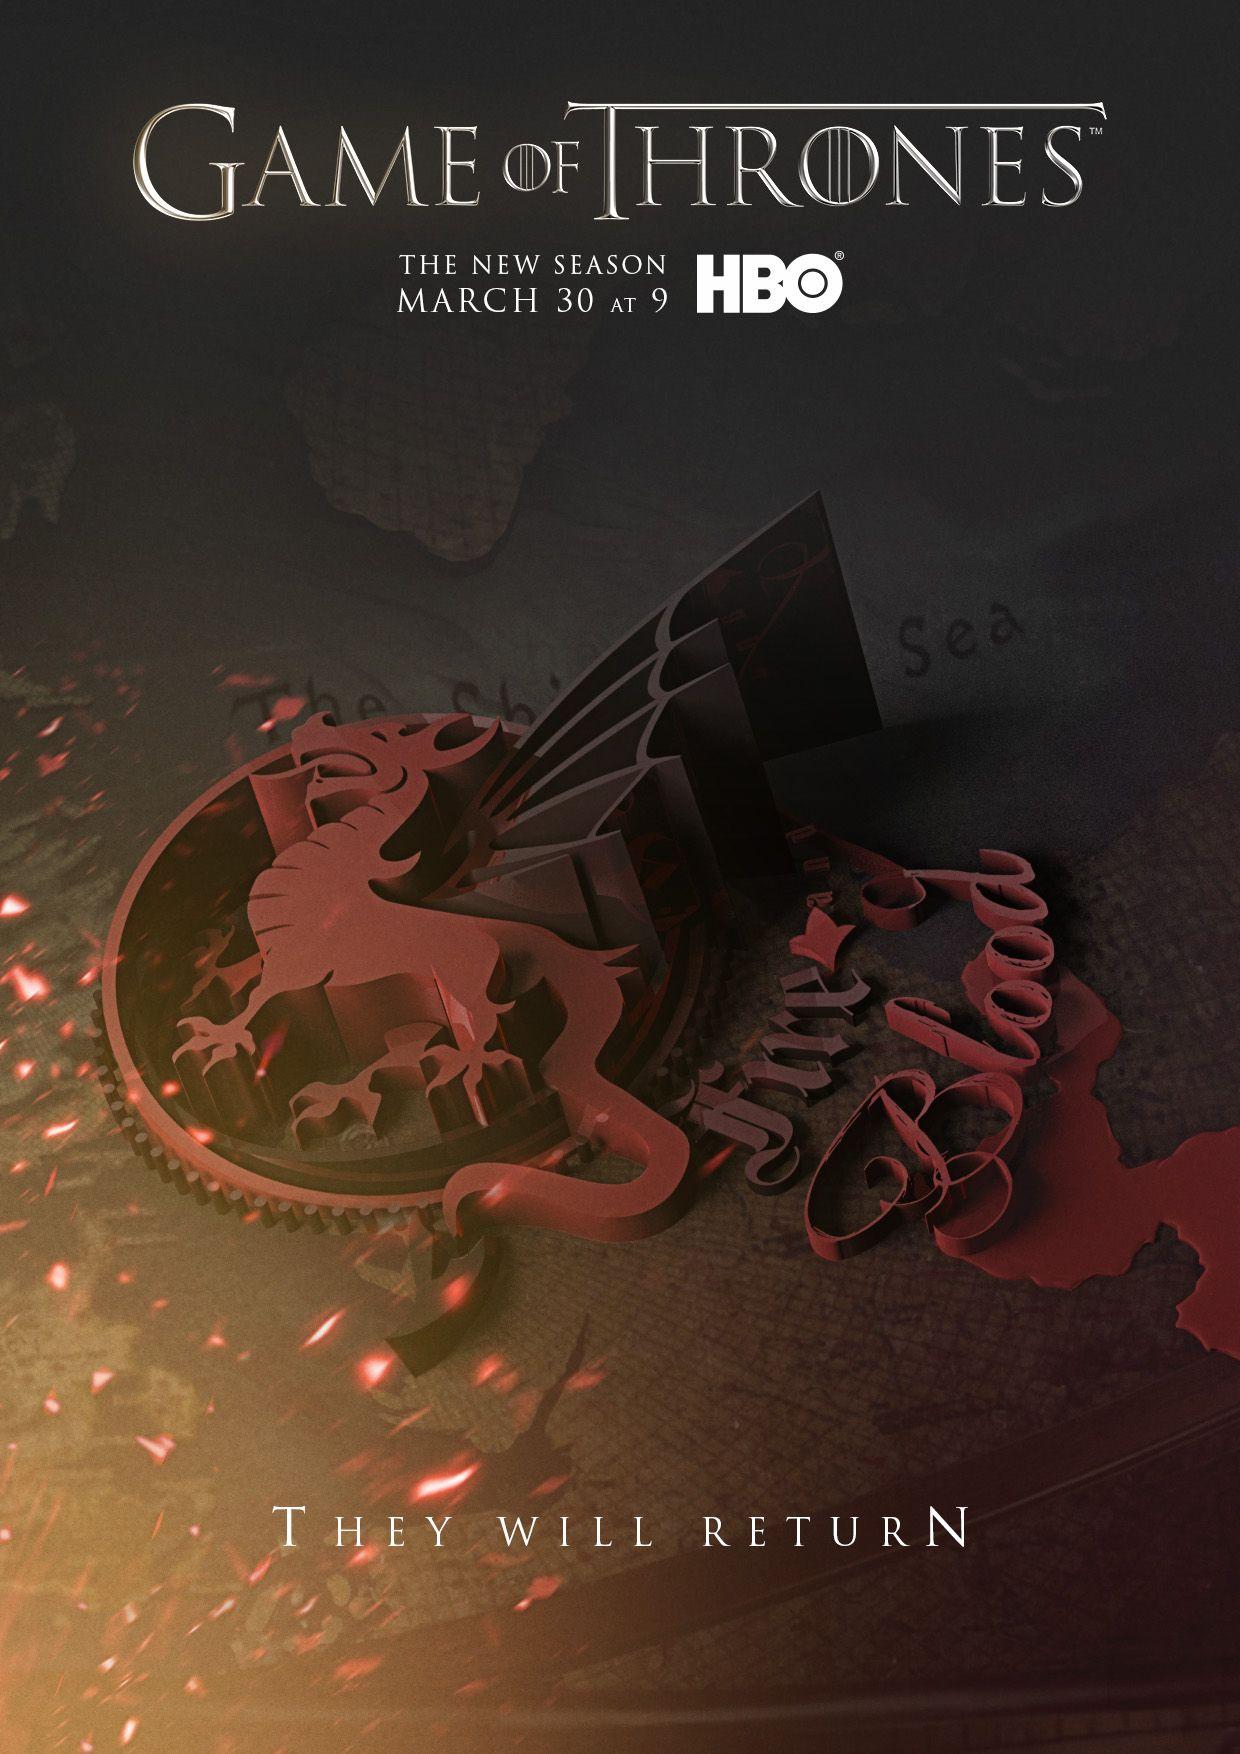 Game Of Thrones Season 4 Posters | Advertising | Pinterest